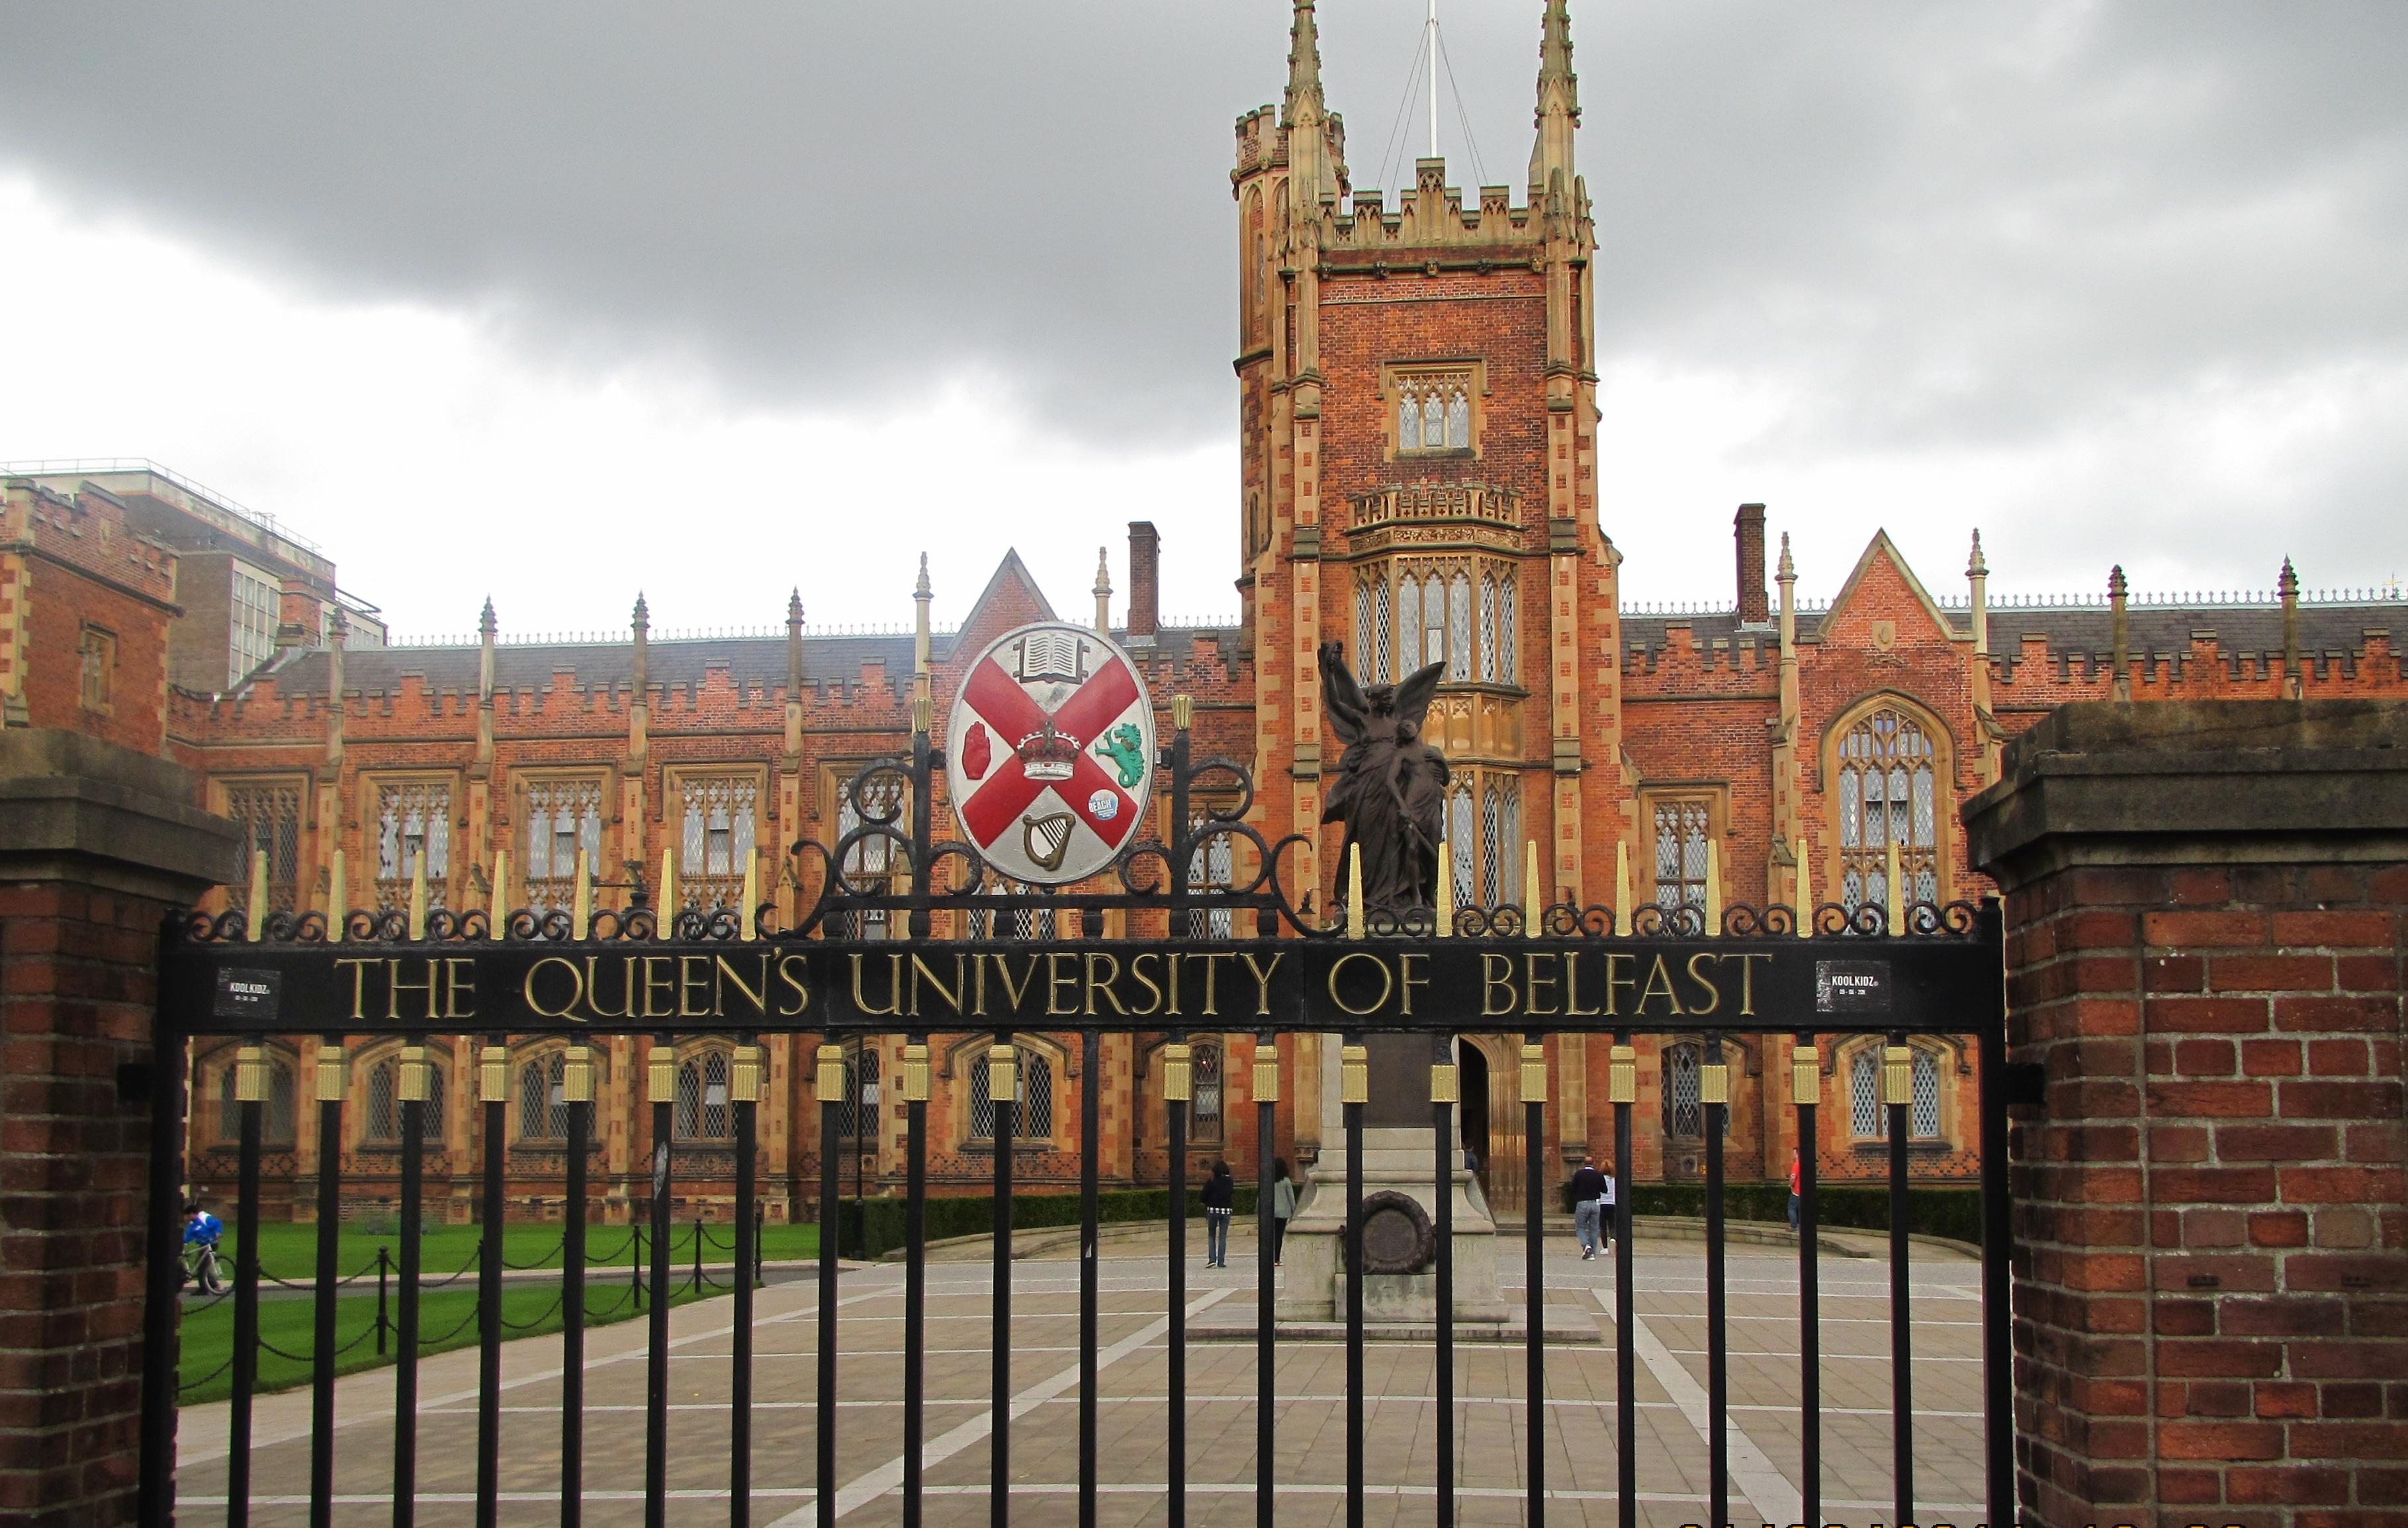 File:Queen's University Belfast by Paride.jpg - Wikimedia Commons